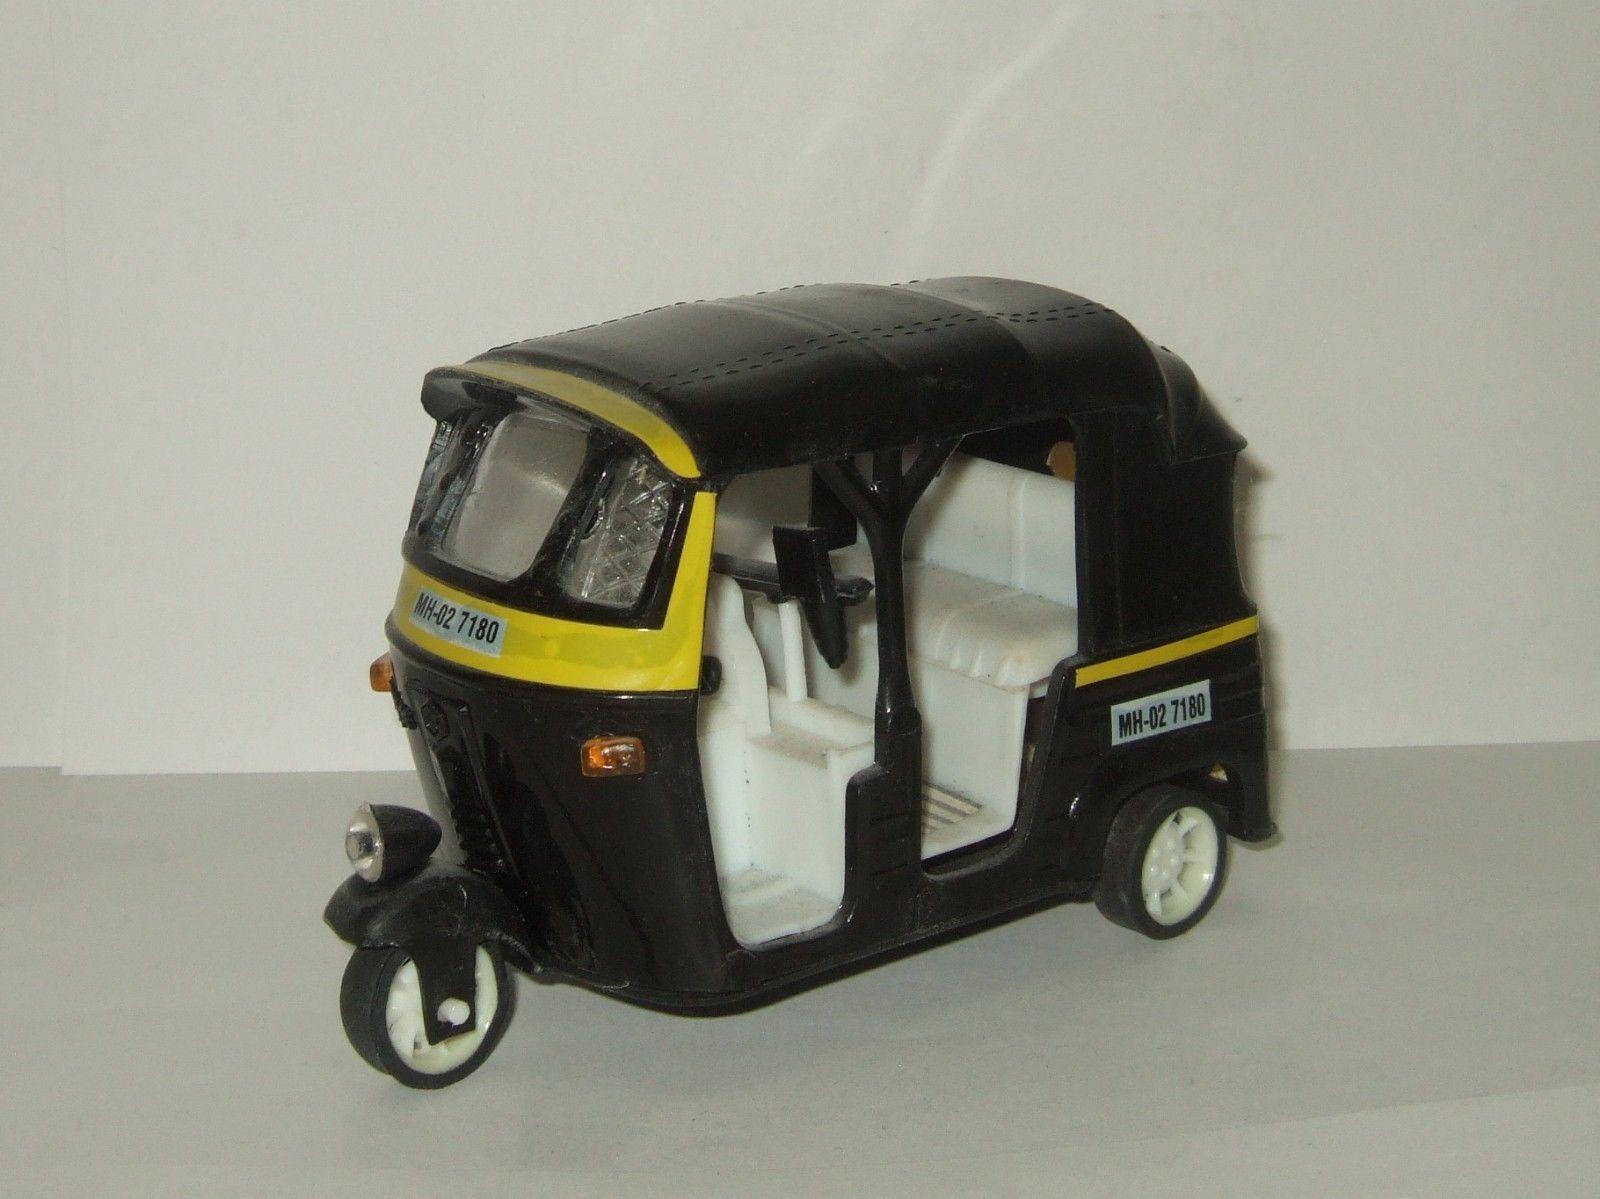 1 18 Tuk tuk taxi 2005 Rare